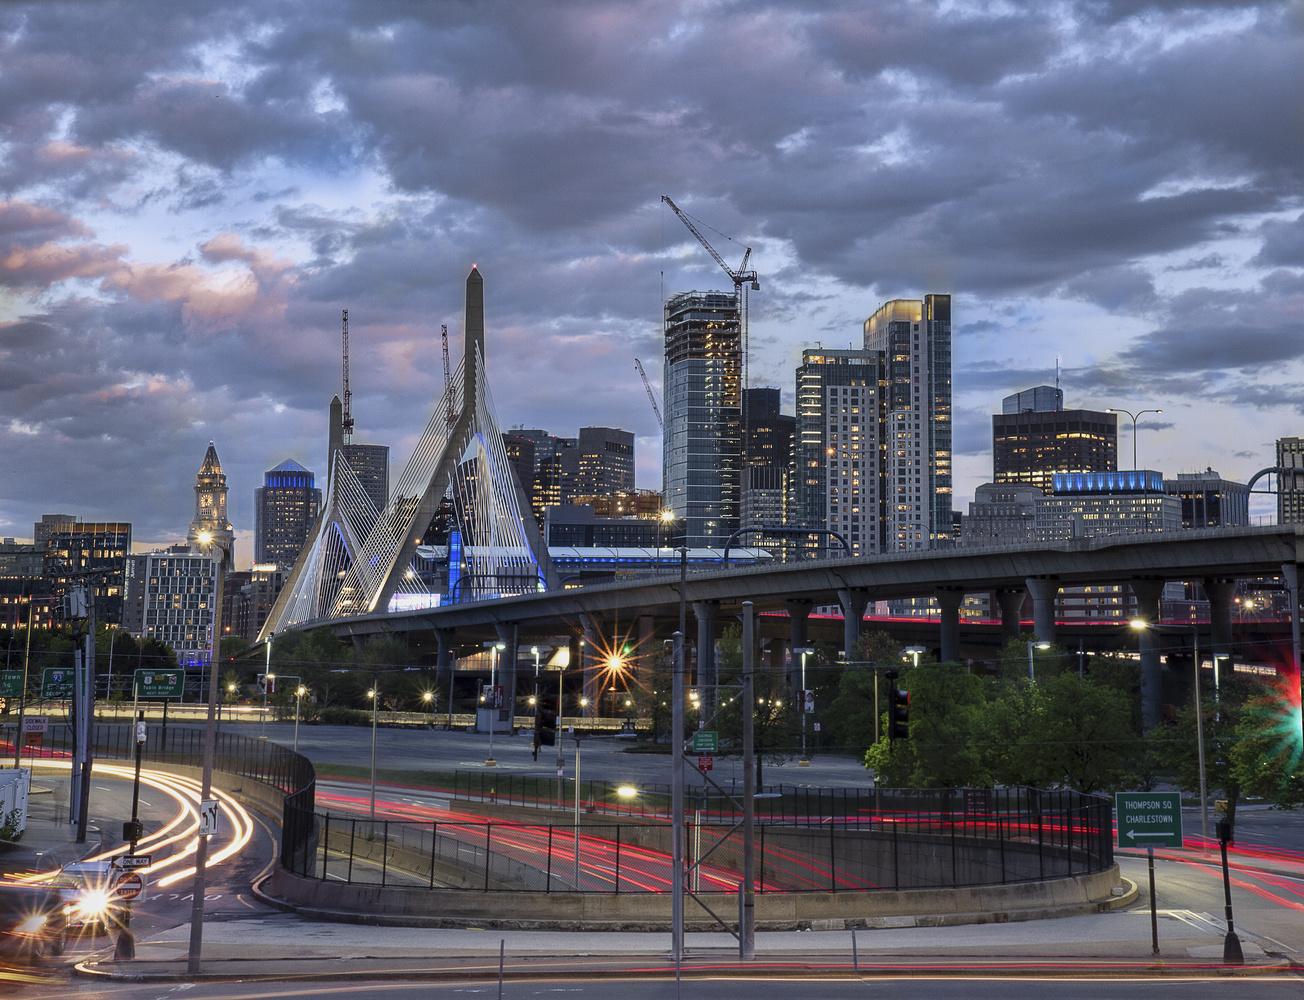 Boston's Northend by Steve Shannon